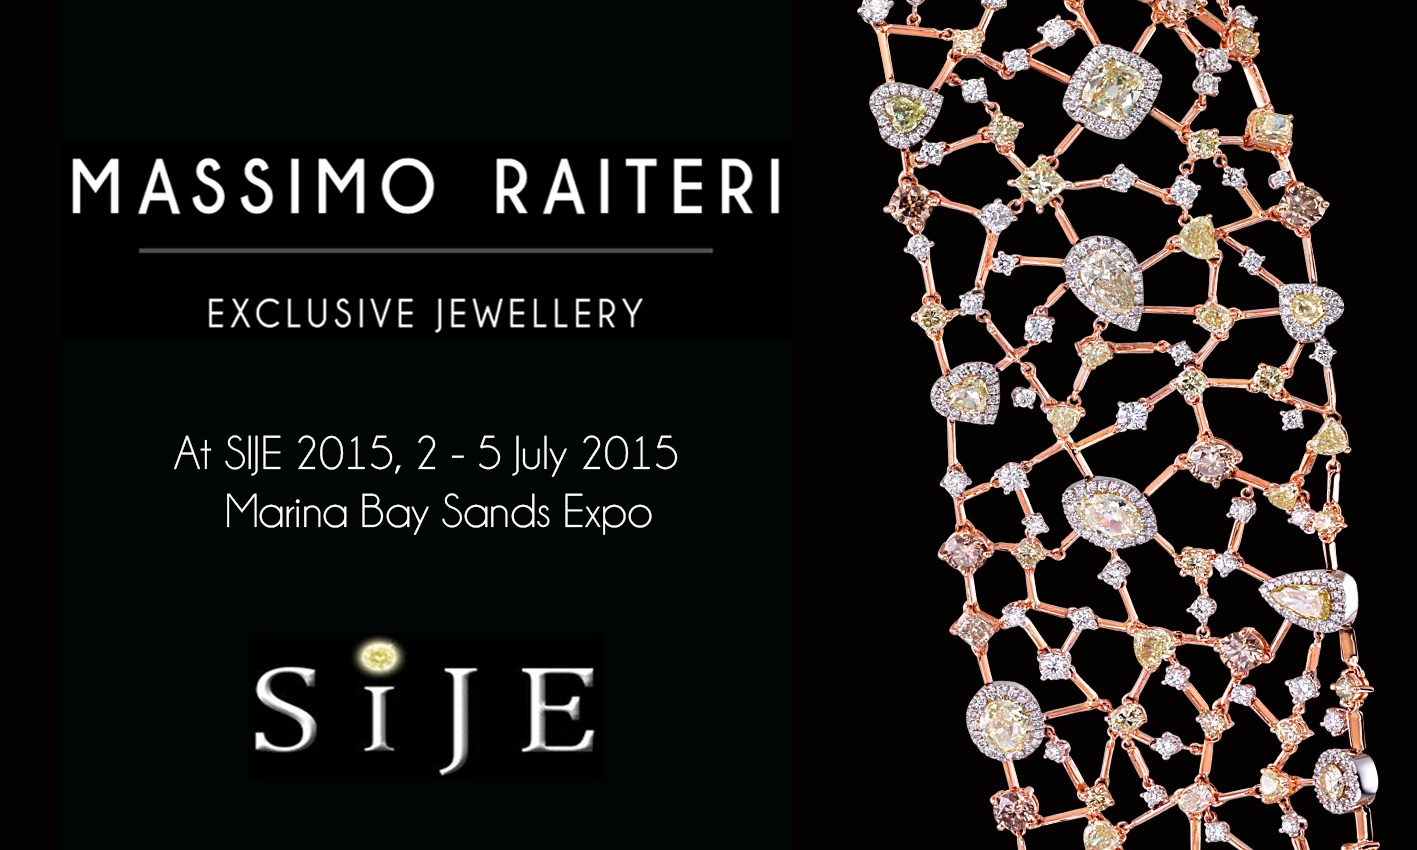 MASSIMO RAITERI AT THE SINGAPORE INTERNATIONAL JEWELRY EXPO (SIJE) 2015